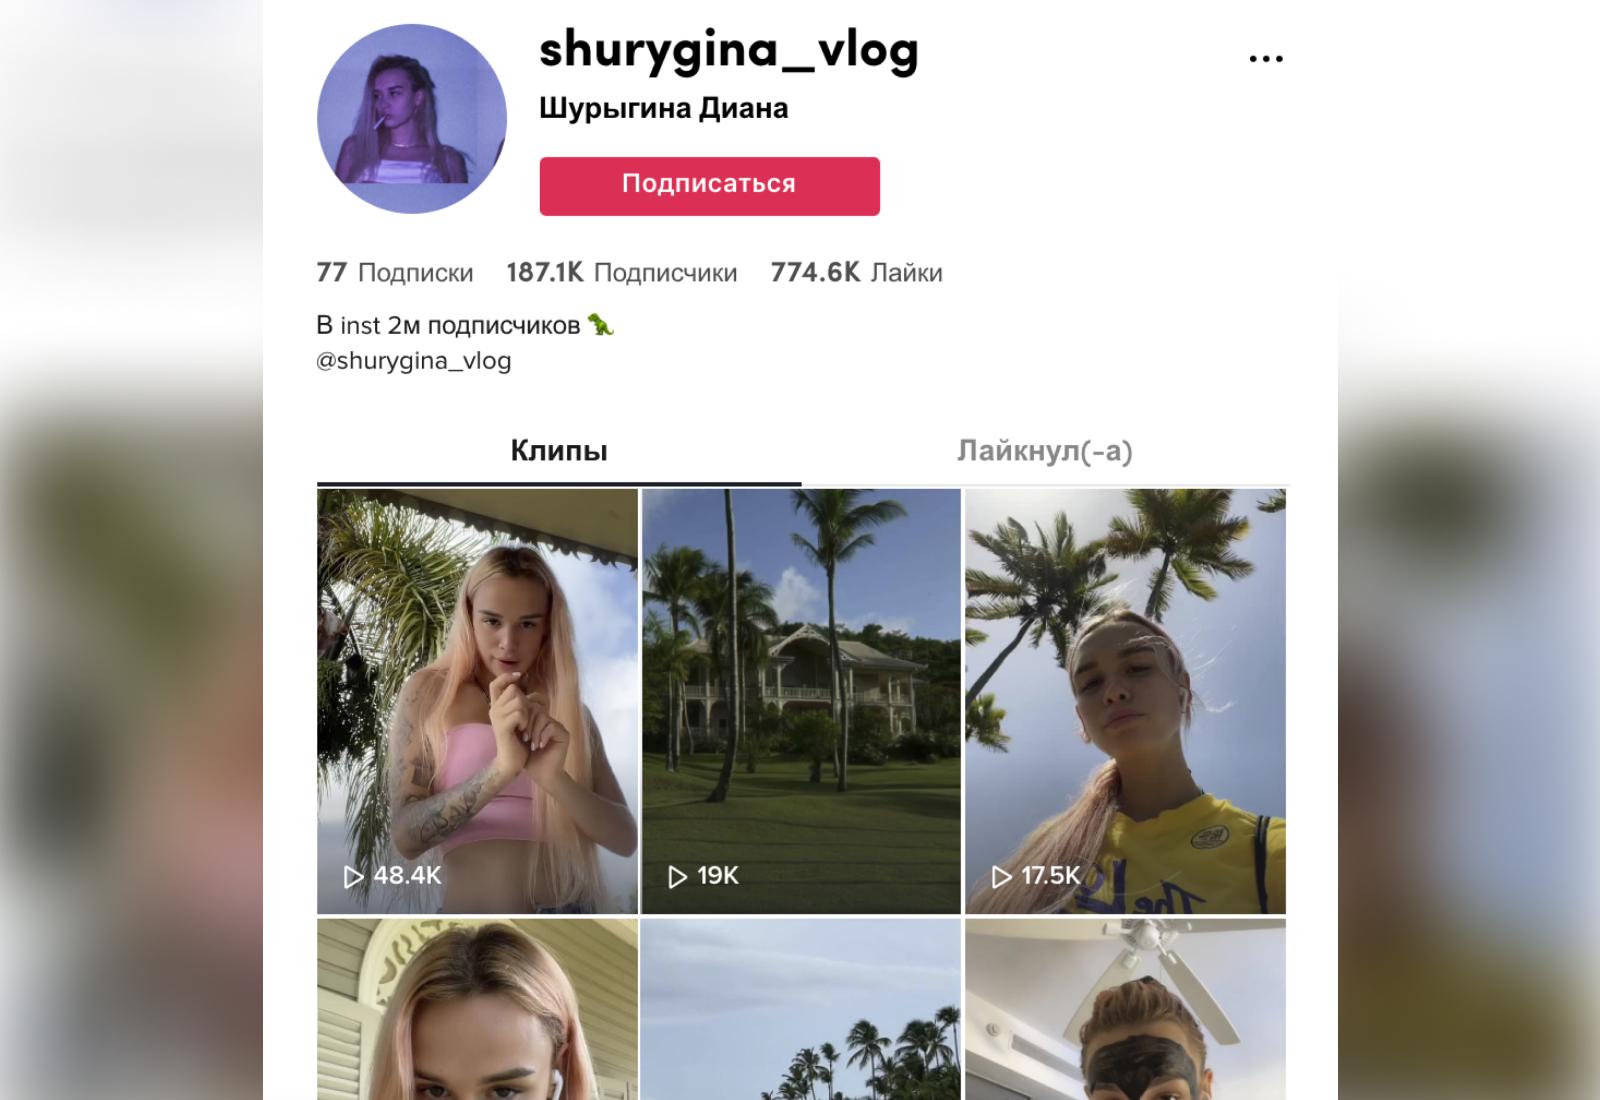 Тикток-аккаунт Дианы. Скриншот © TikTok / shurygina_vlog